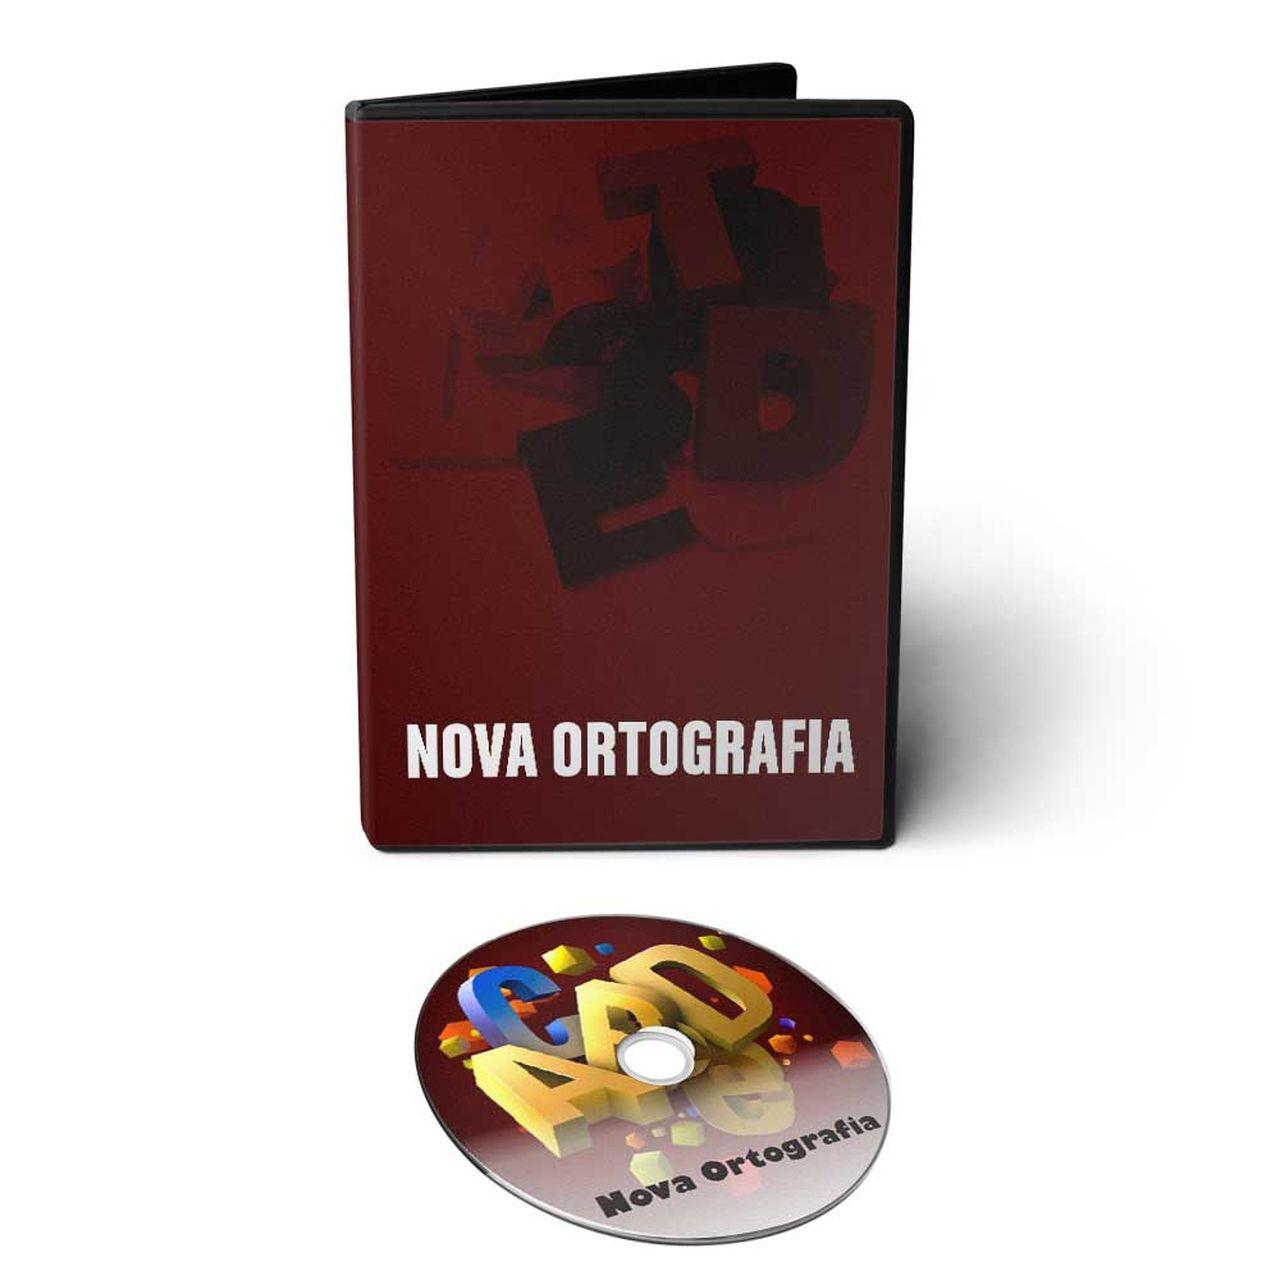 Curso sobre a Nova Ortografia da Língua Portuguesa em DVD Videoaula  - Aprova Cursos